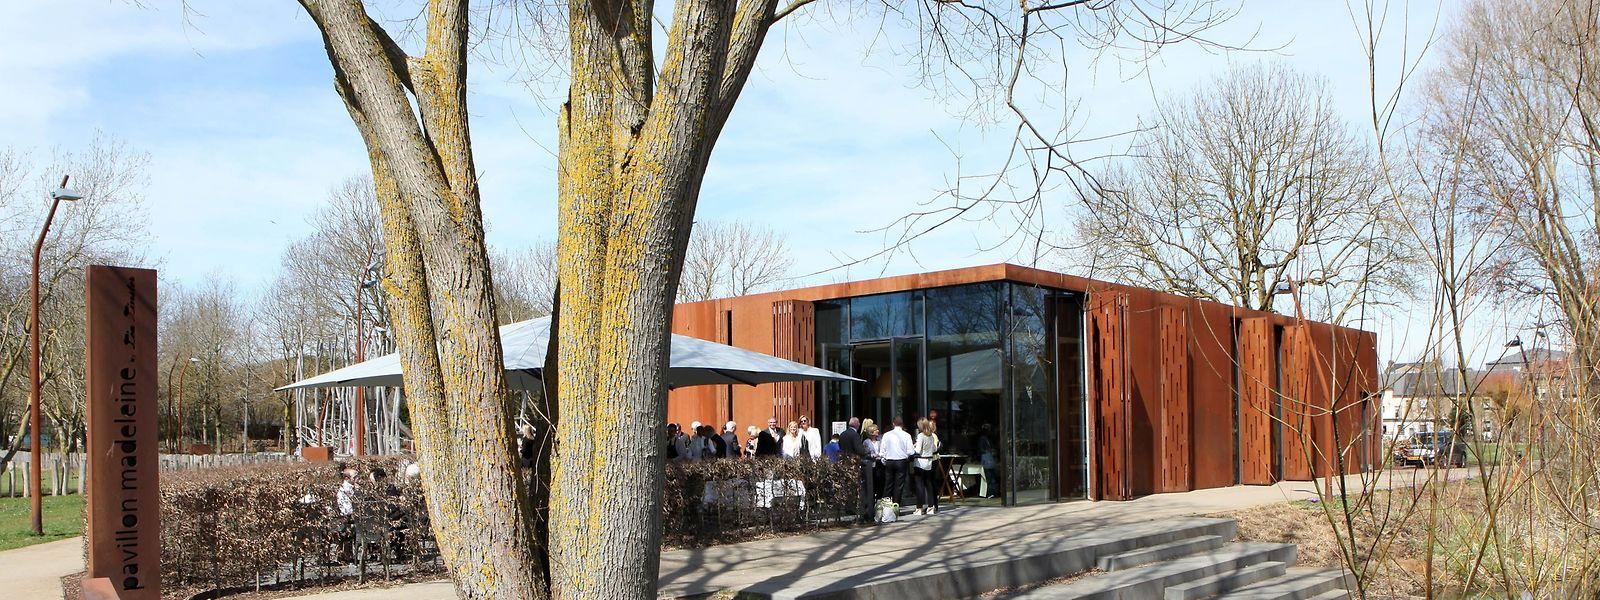 Der Pavillon im Kayler Park dürfte auch den Namen ändern.